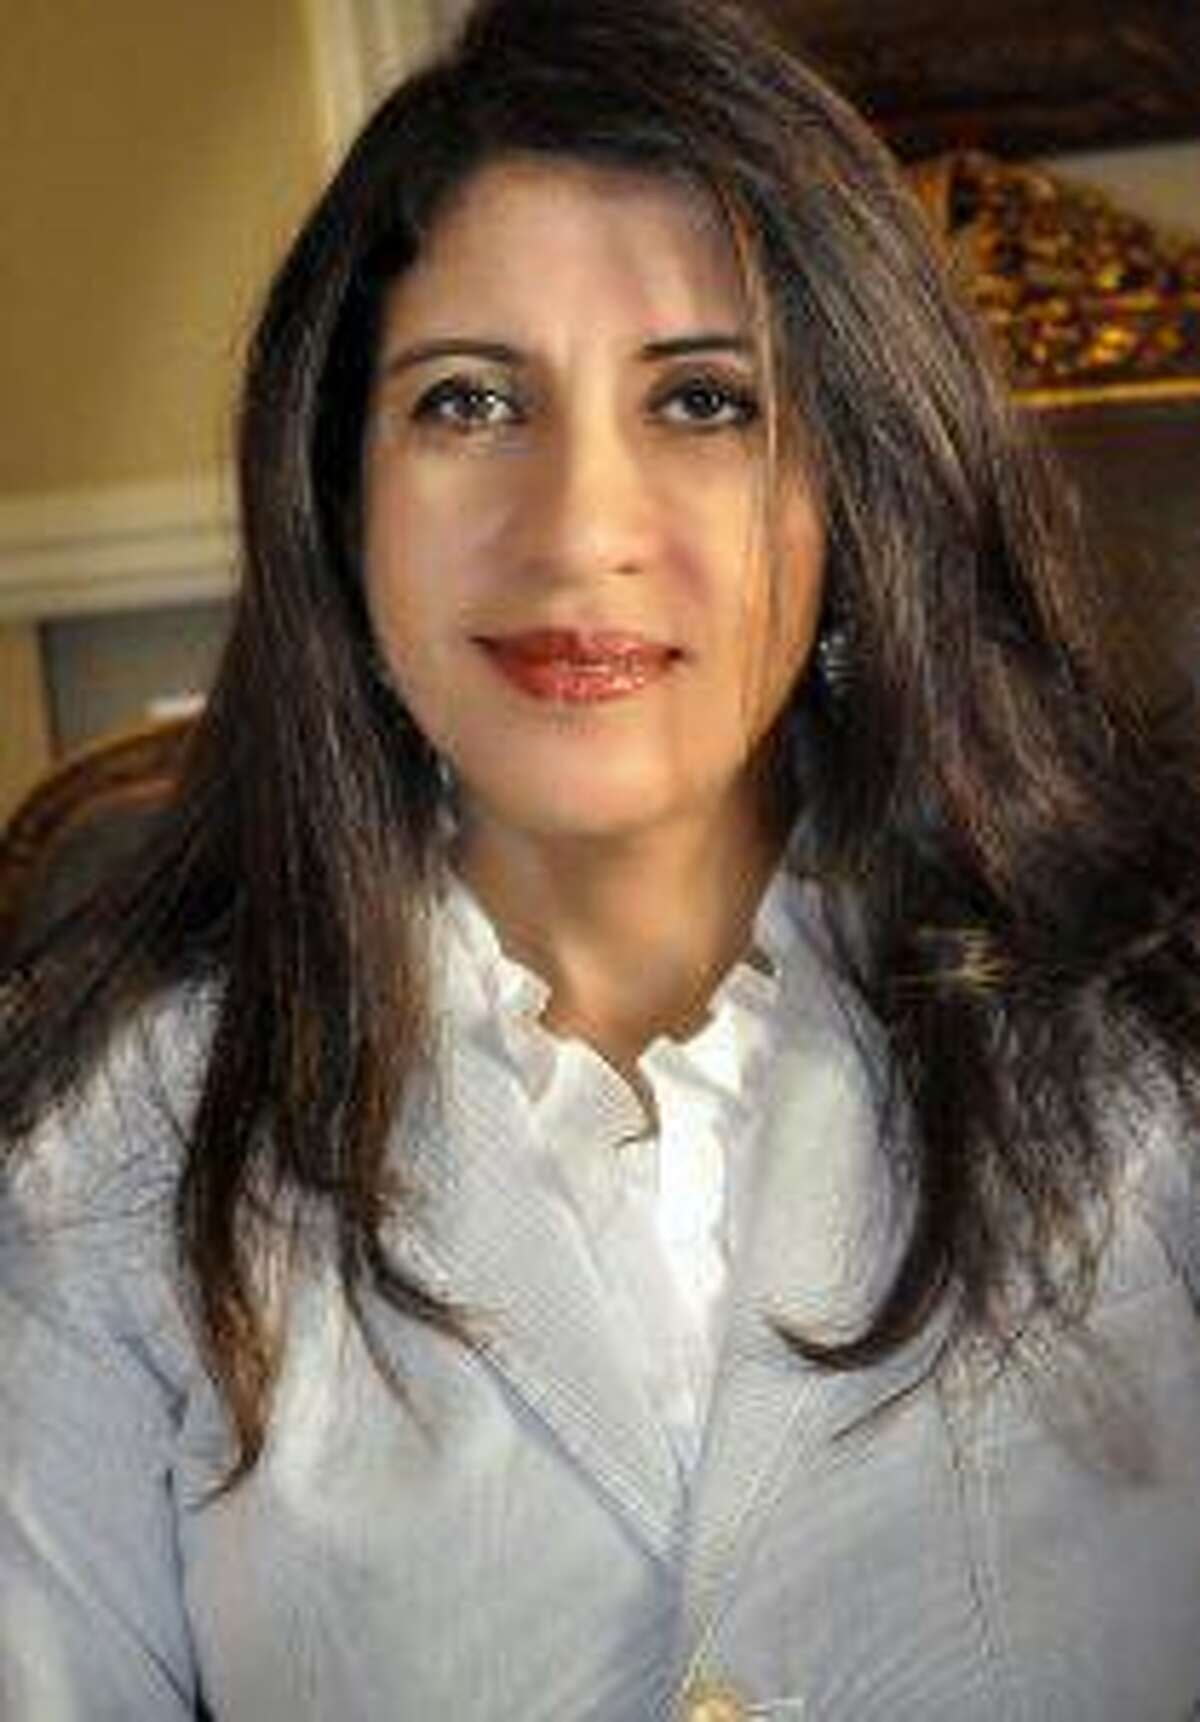 World-renowned paleo-radiologist Sahar Saleem will present